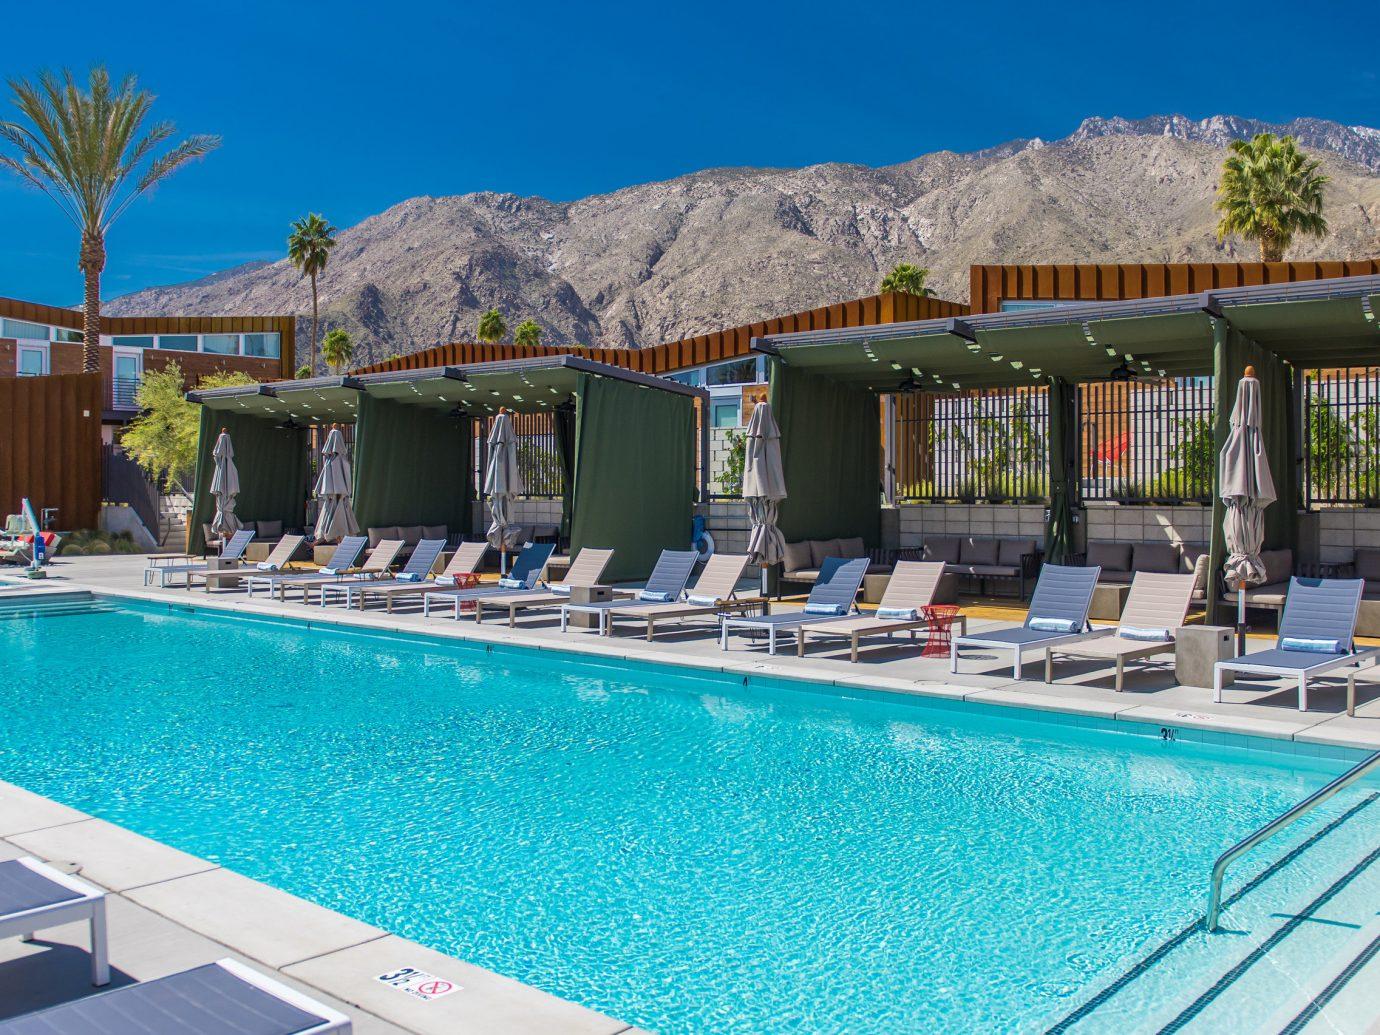 Jetsetter Guides swimming pool outdoor leisure property Resort estate Pool Villa vacation blue condominium resort town real estate swimming